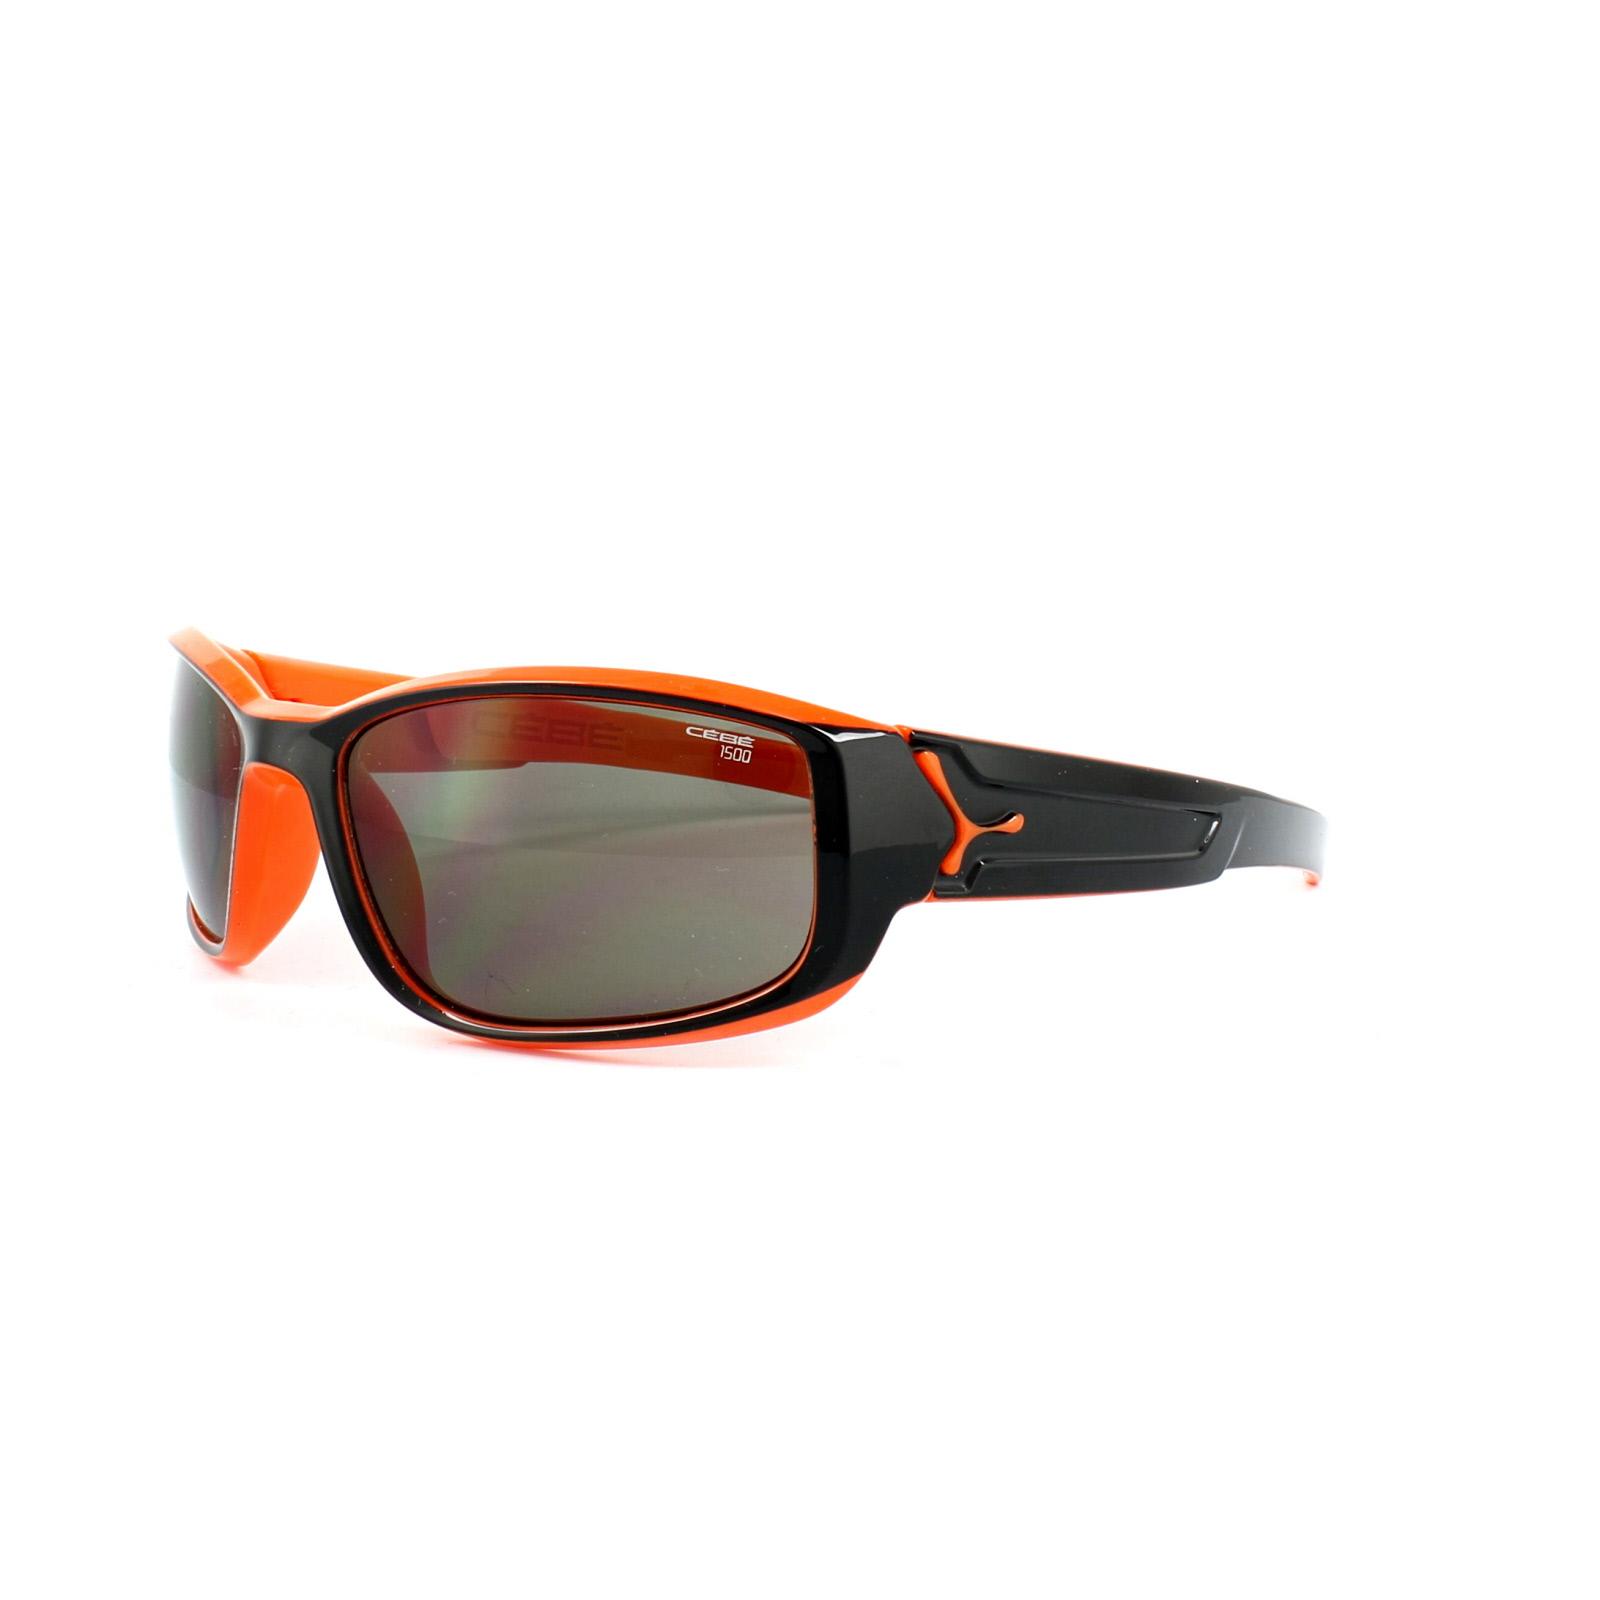 3fdfbf45b6297 Sentinel Cebe Sunglasses S Break CBSBRK2 Shiny Black   Orange 1500 Grey  Small